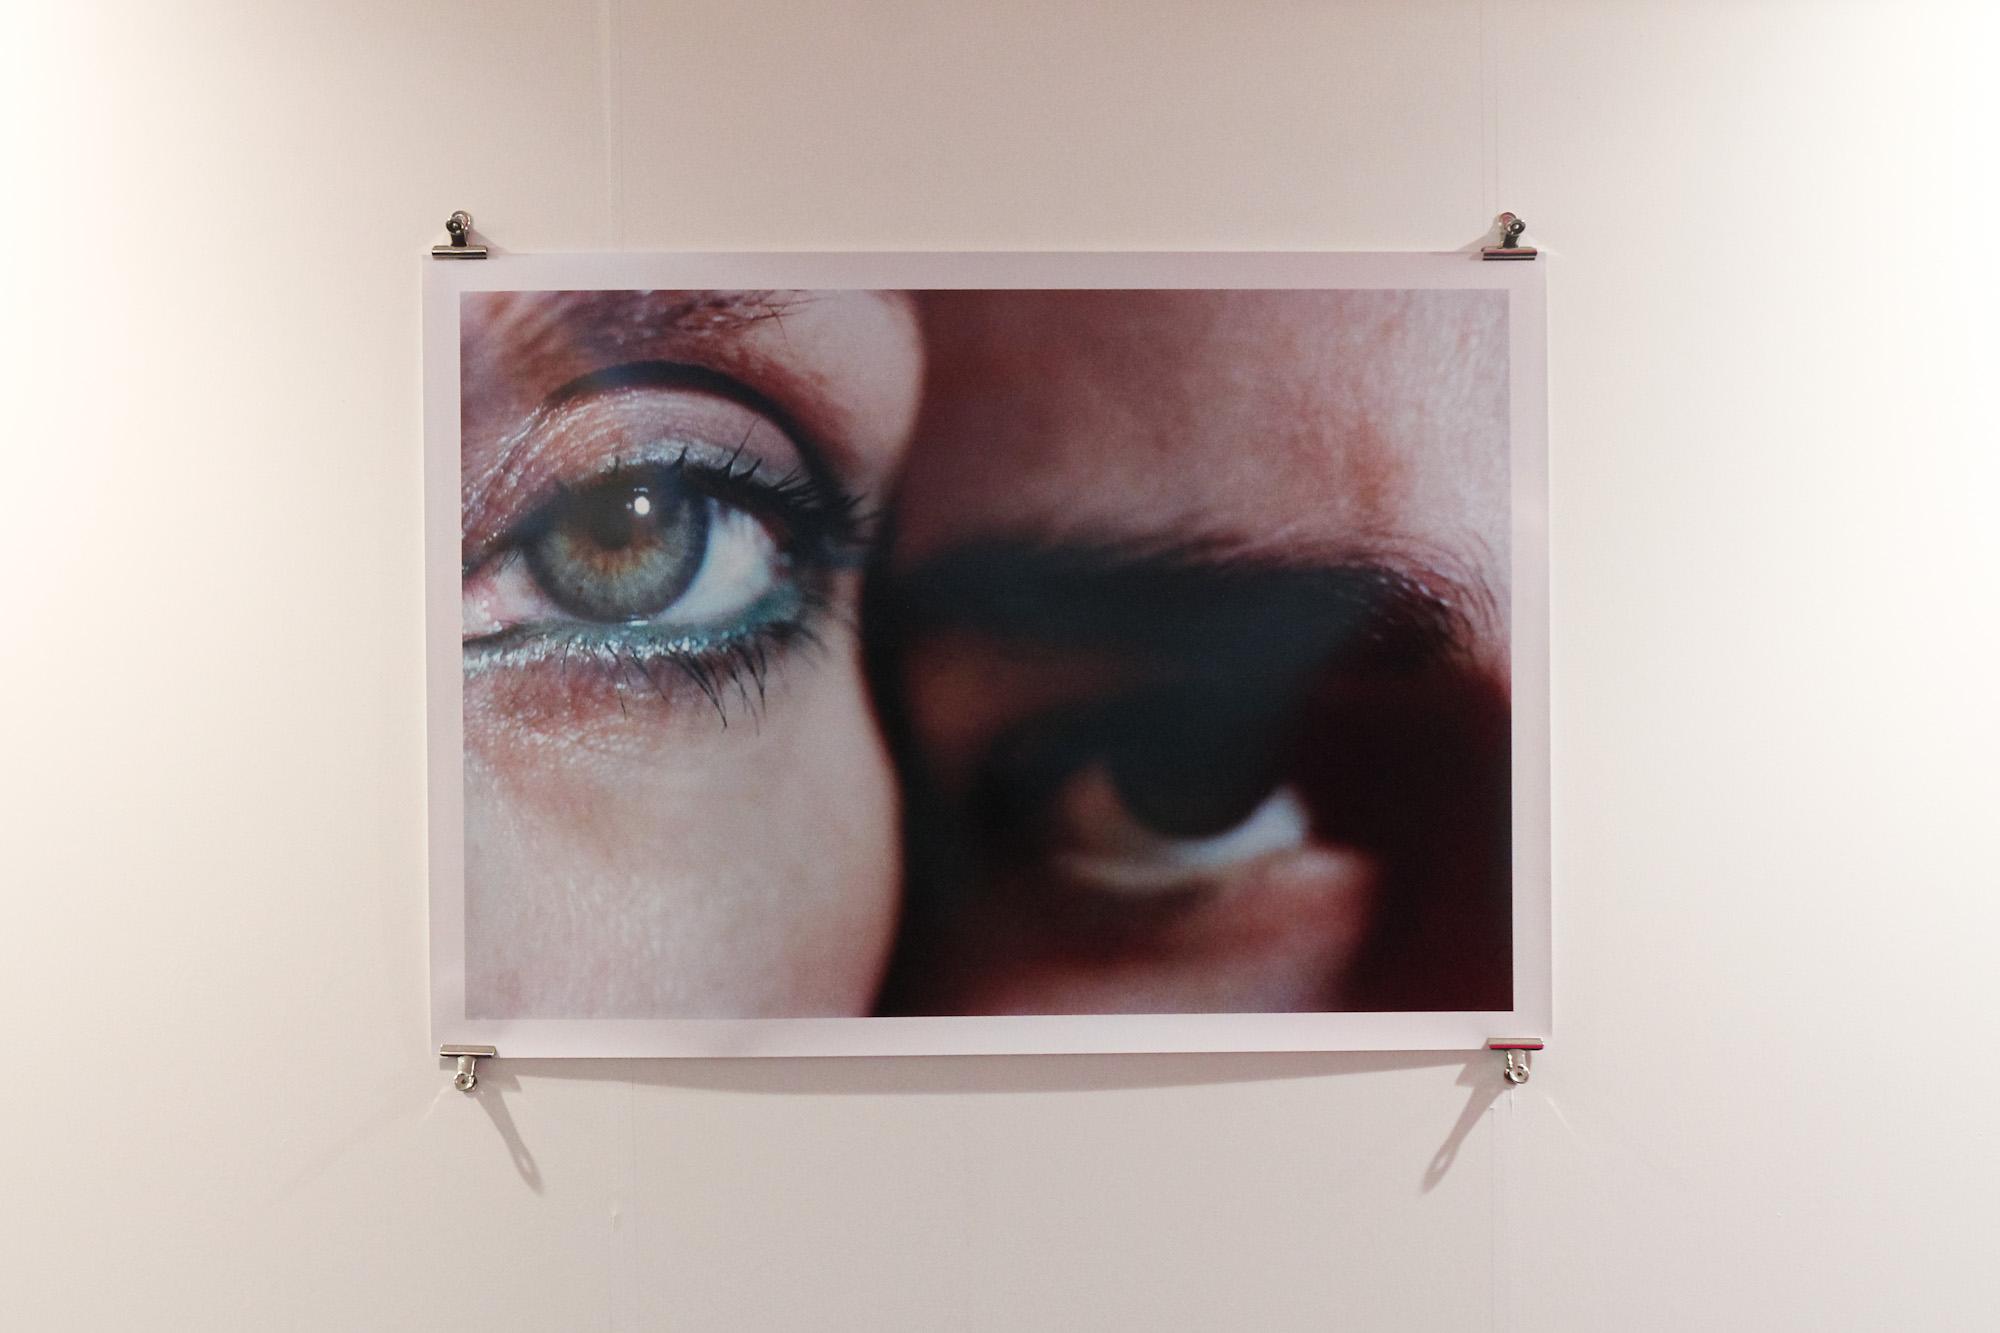 Two Eyes, 1993 by Elinor Carucci